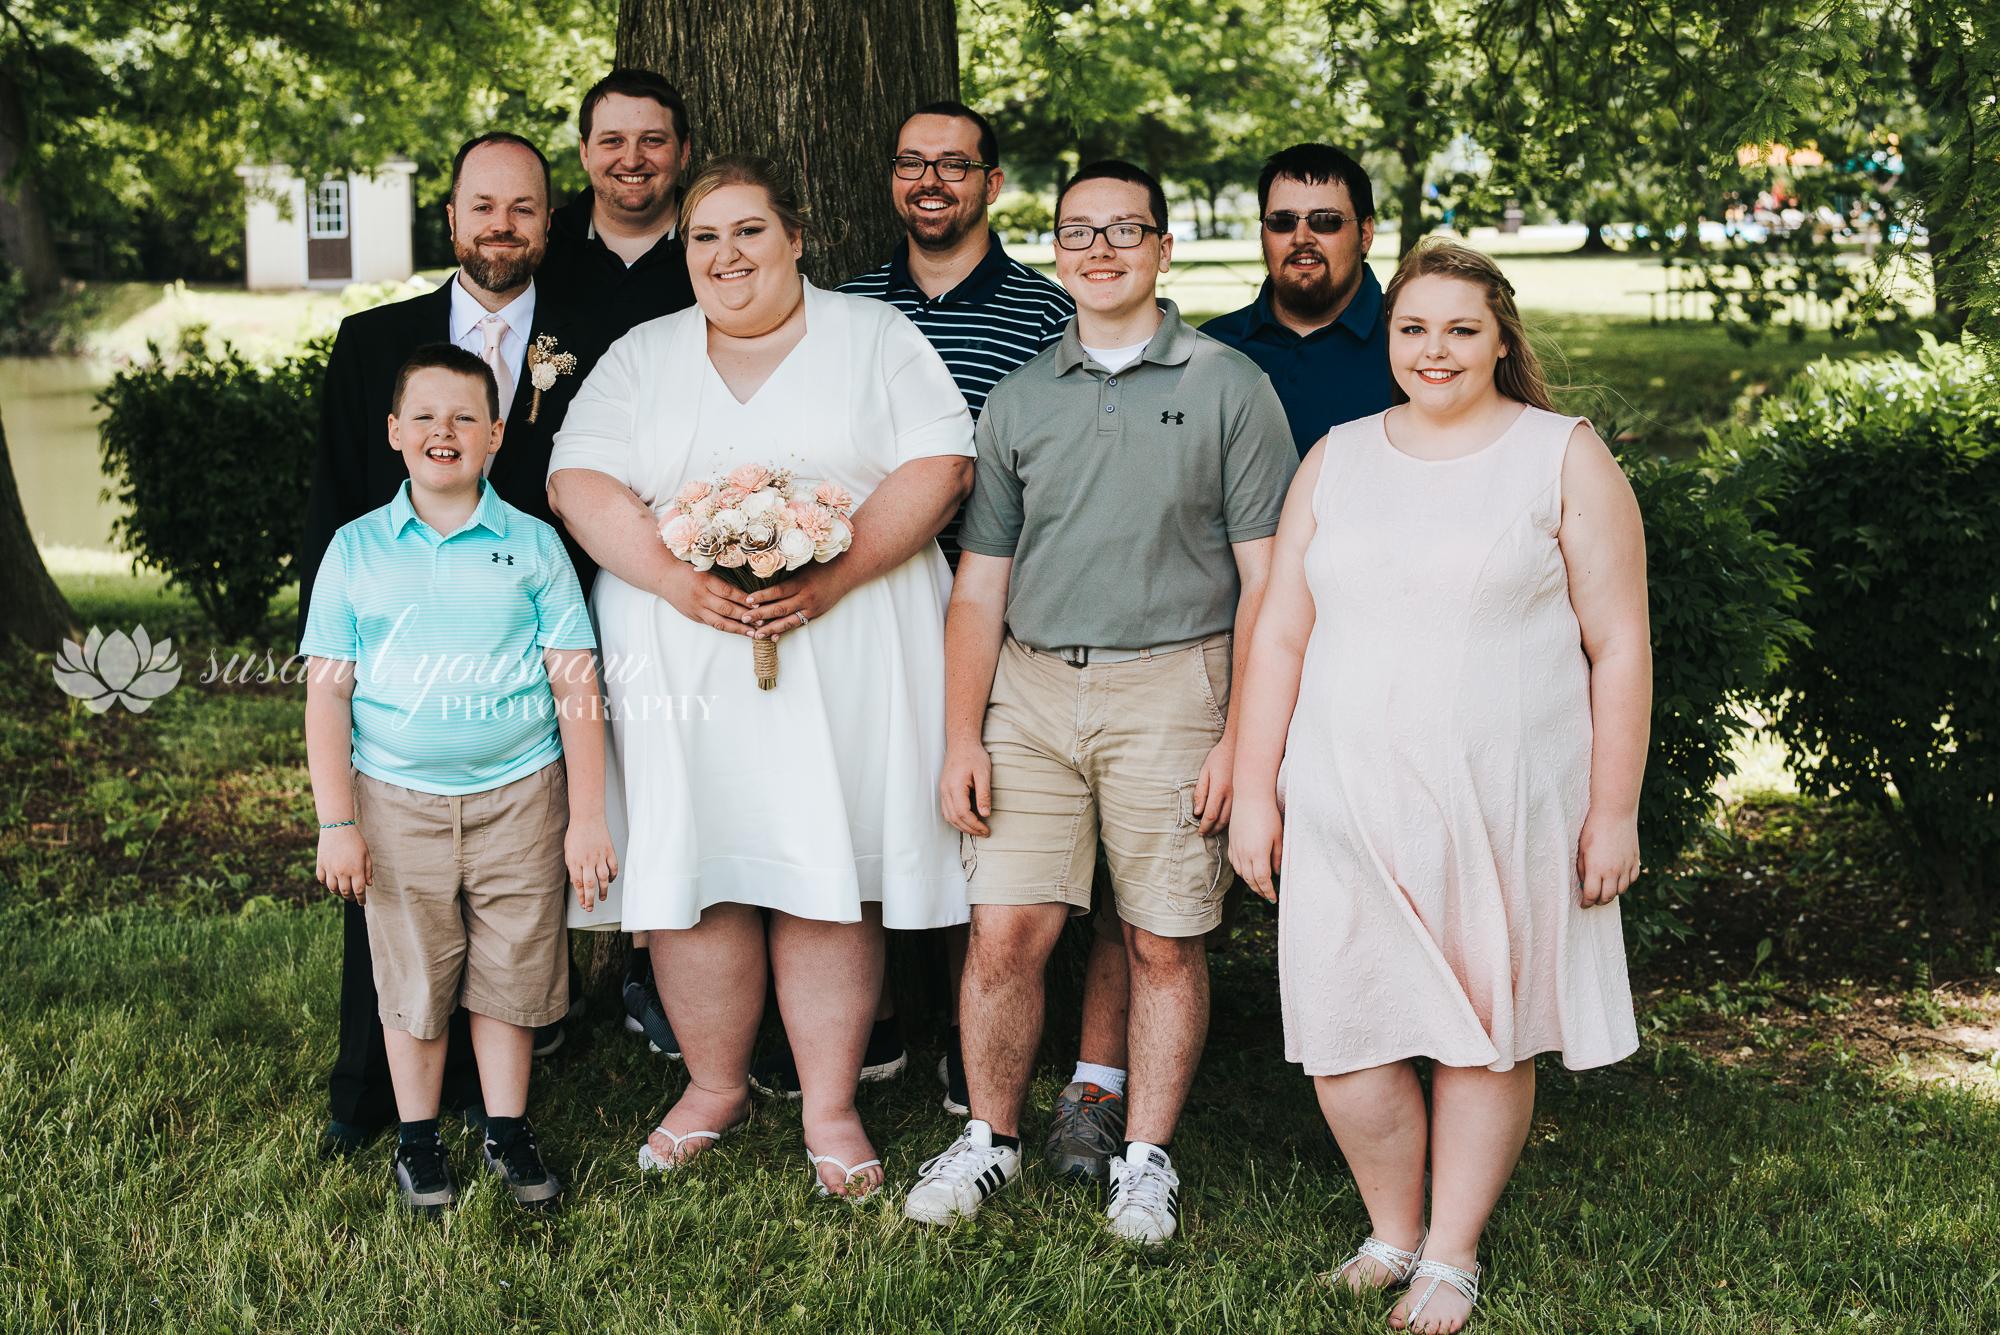 Bill and Sarah Wedding Photos 06-08-2019 SLY Photography -48.jpg